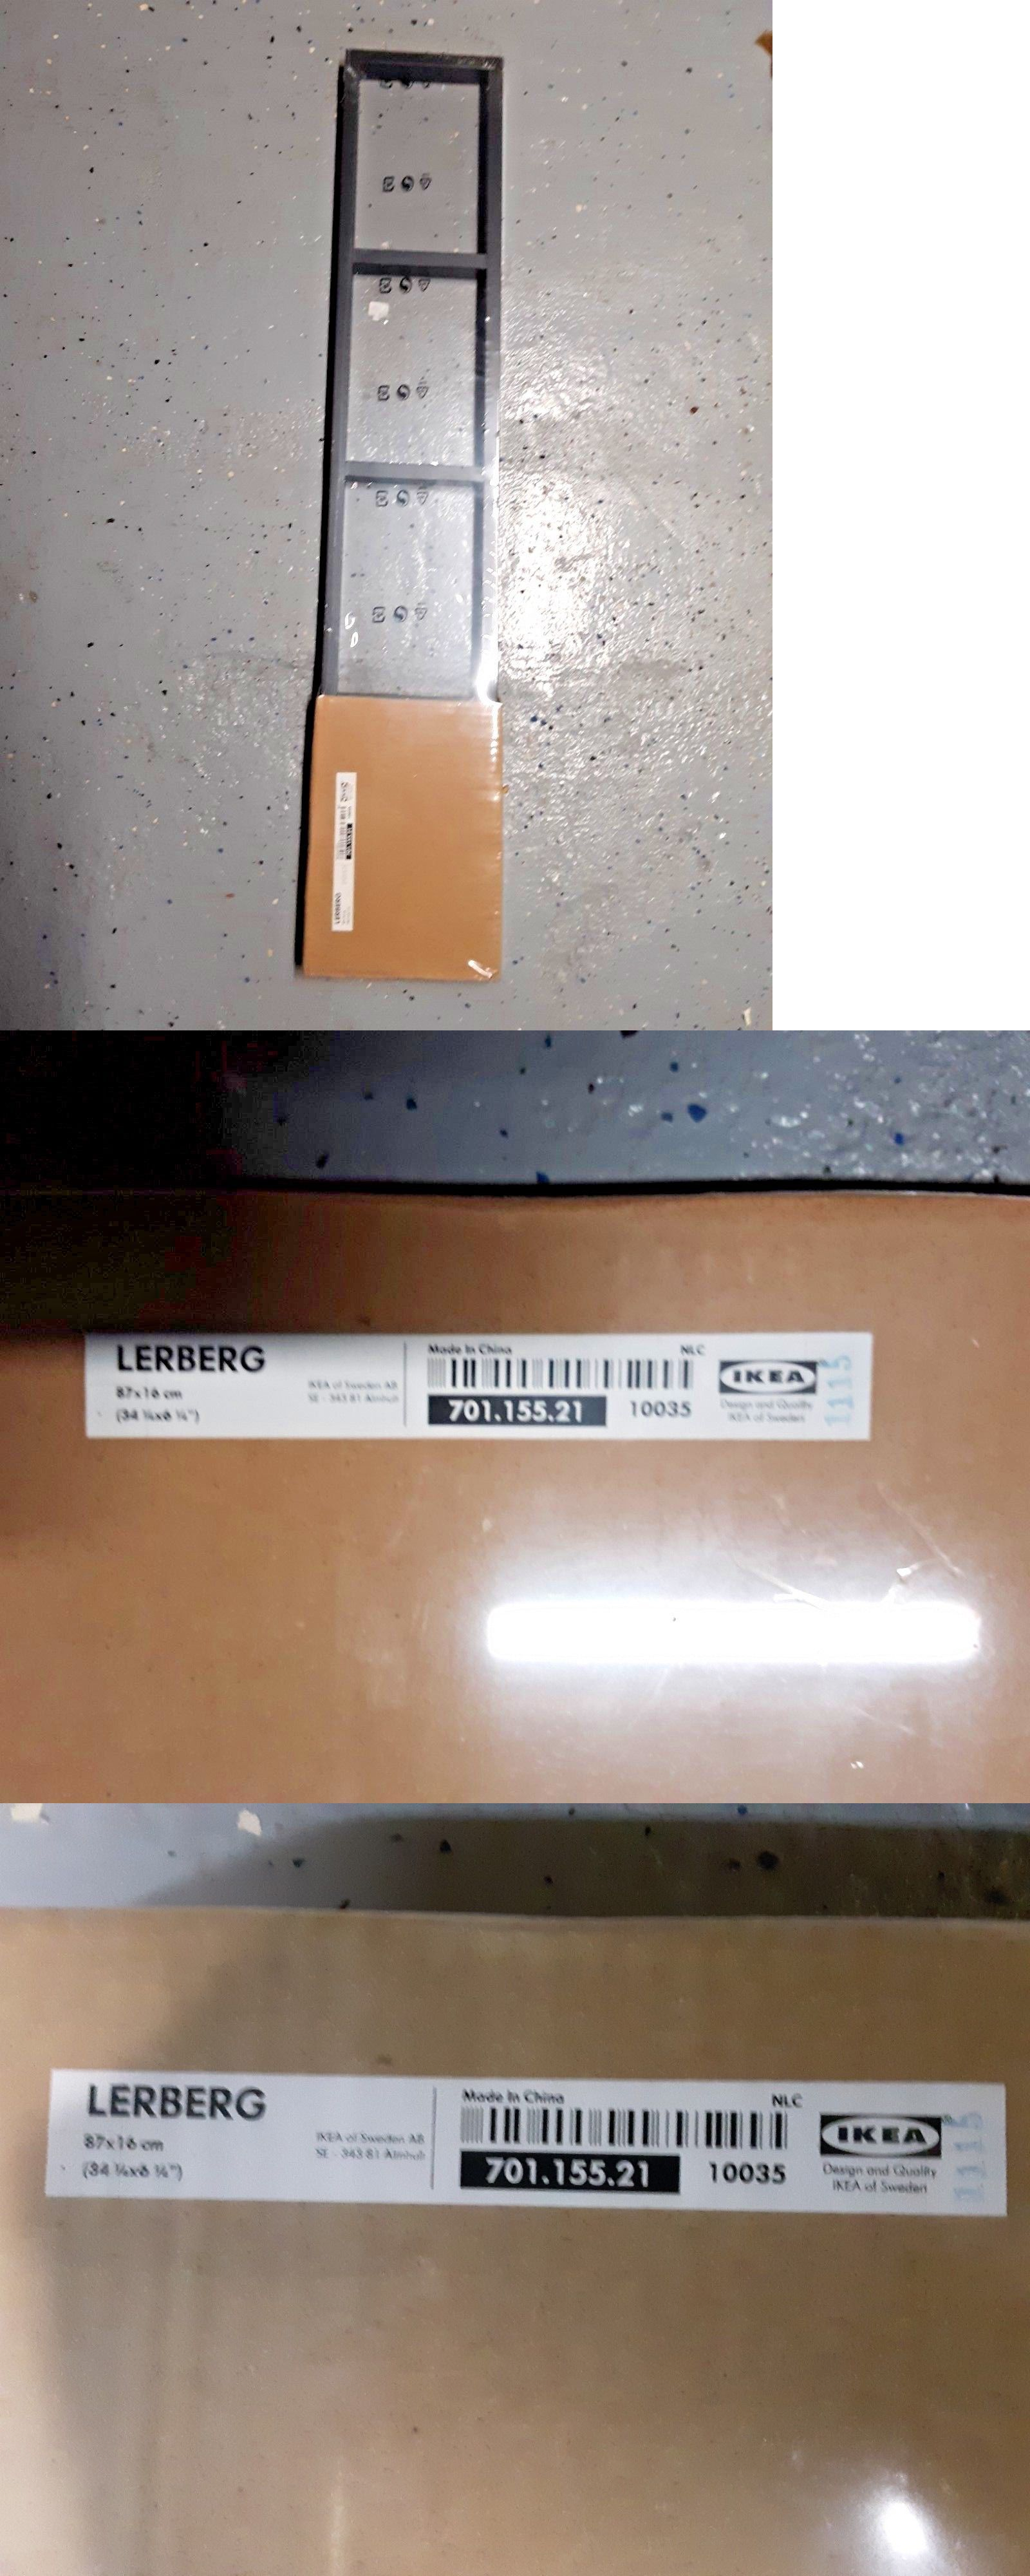 Cd And Video Racks 22653 New Ikea Lerberg Wall Mount Media Shelf Rack Dvd Blu Ray Black It Now Only 21 95 On Ebay